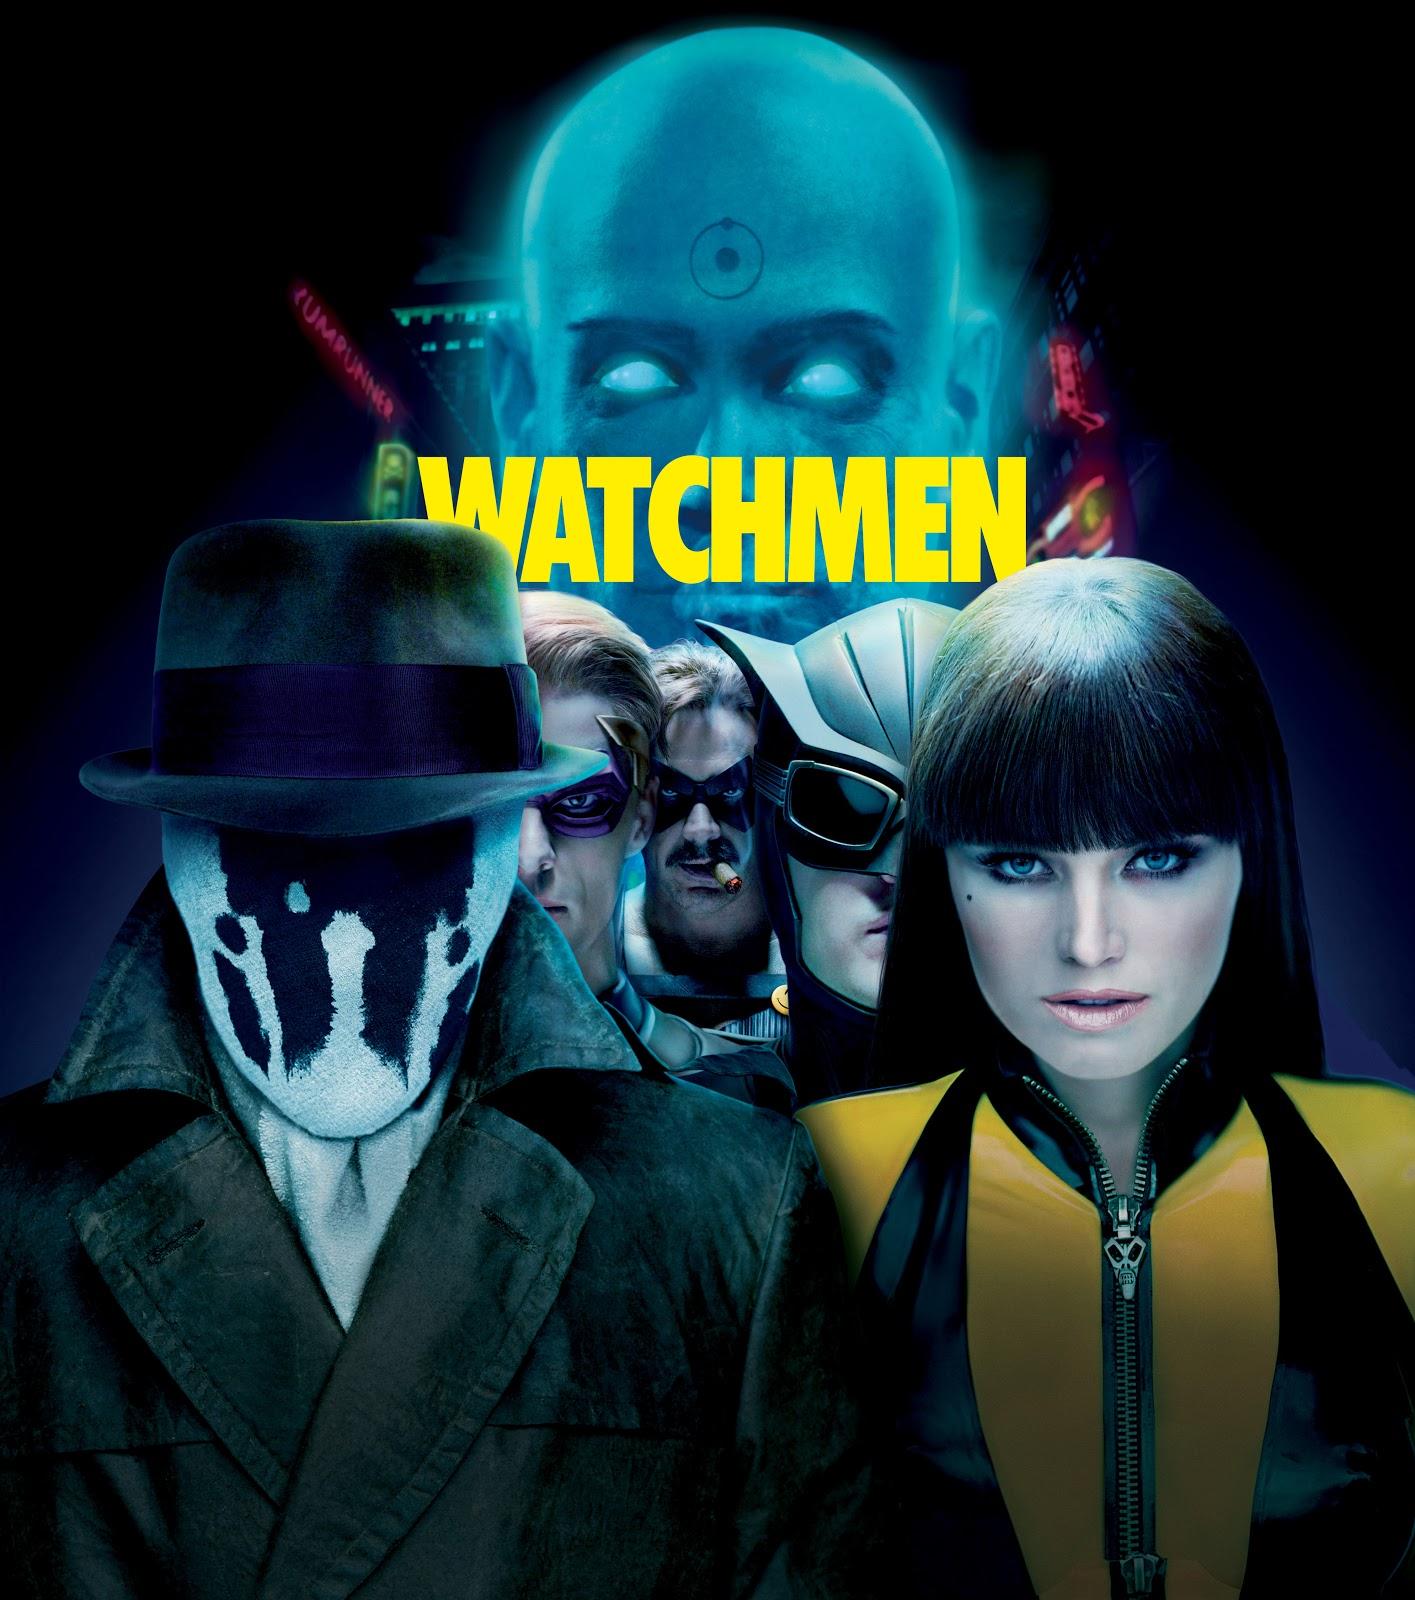 http://2.bp.blogspot.com/-l9lKebOv13s/Tw2gPZ34uhI/AAAAAAAABho/V4PIZ1gfXws/s1600/Watchmen-Poster-23.jpg